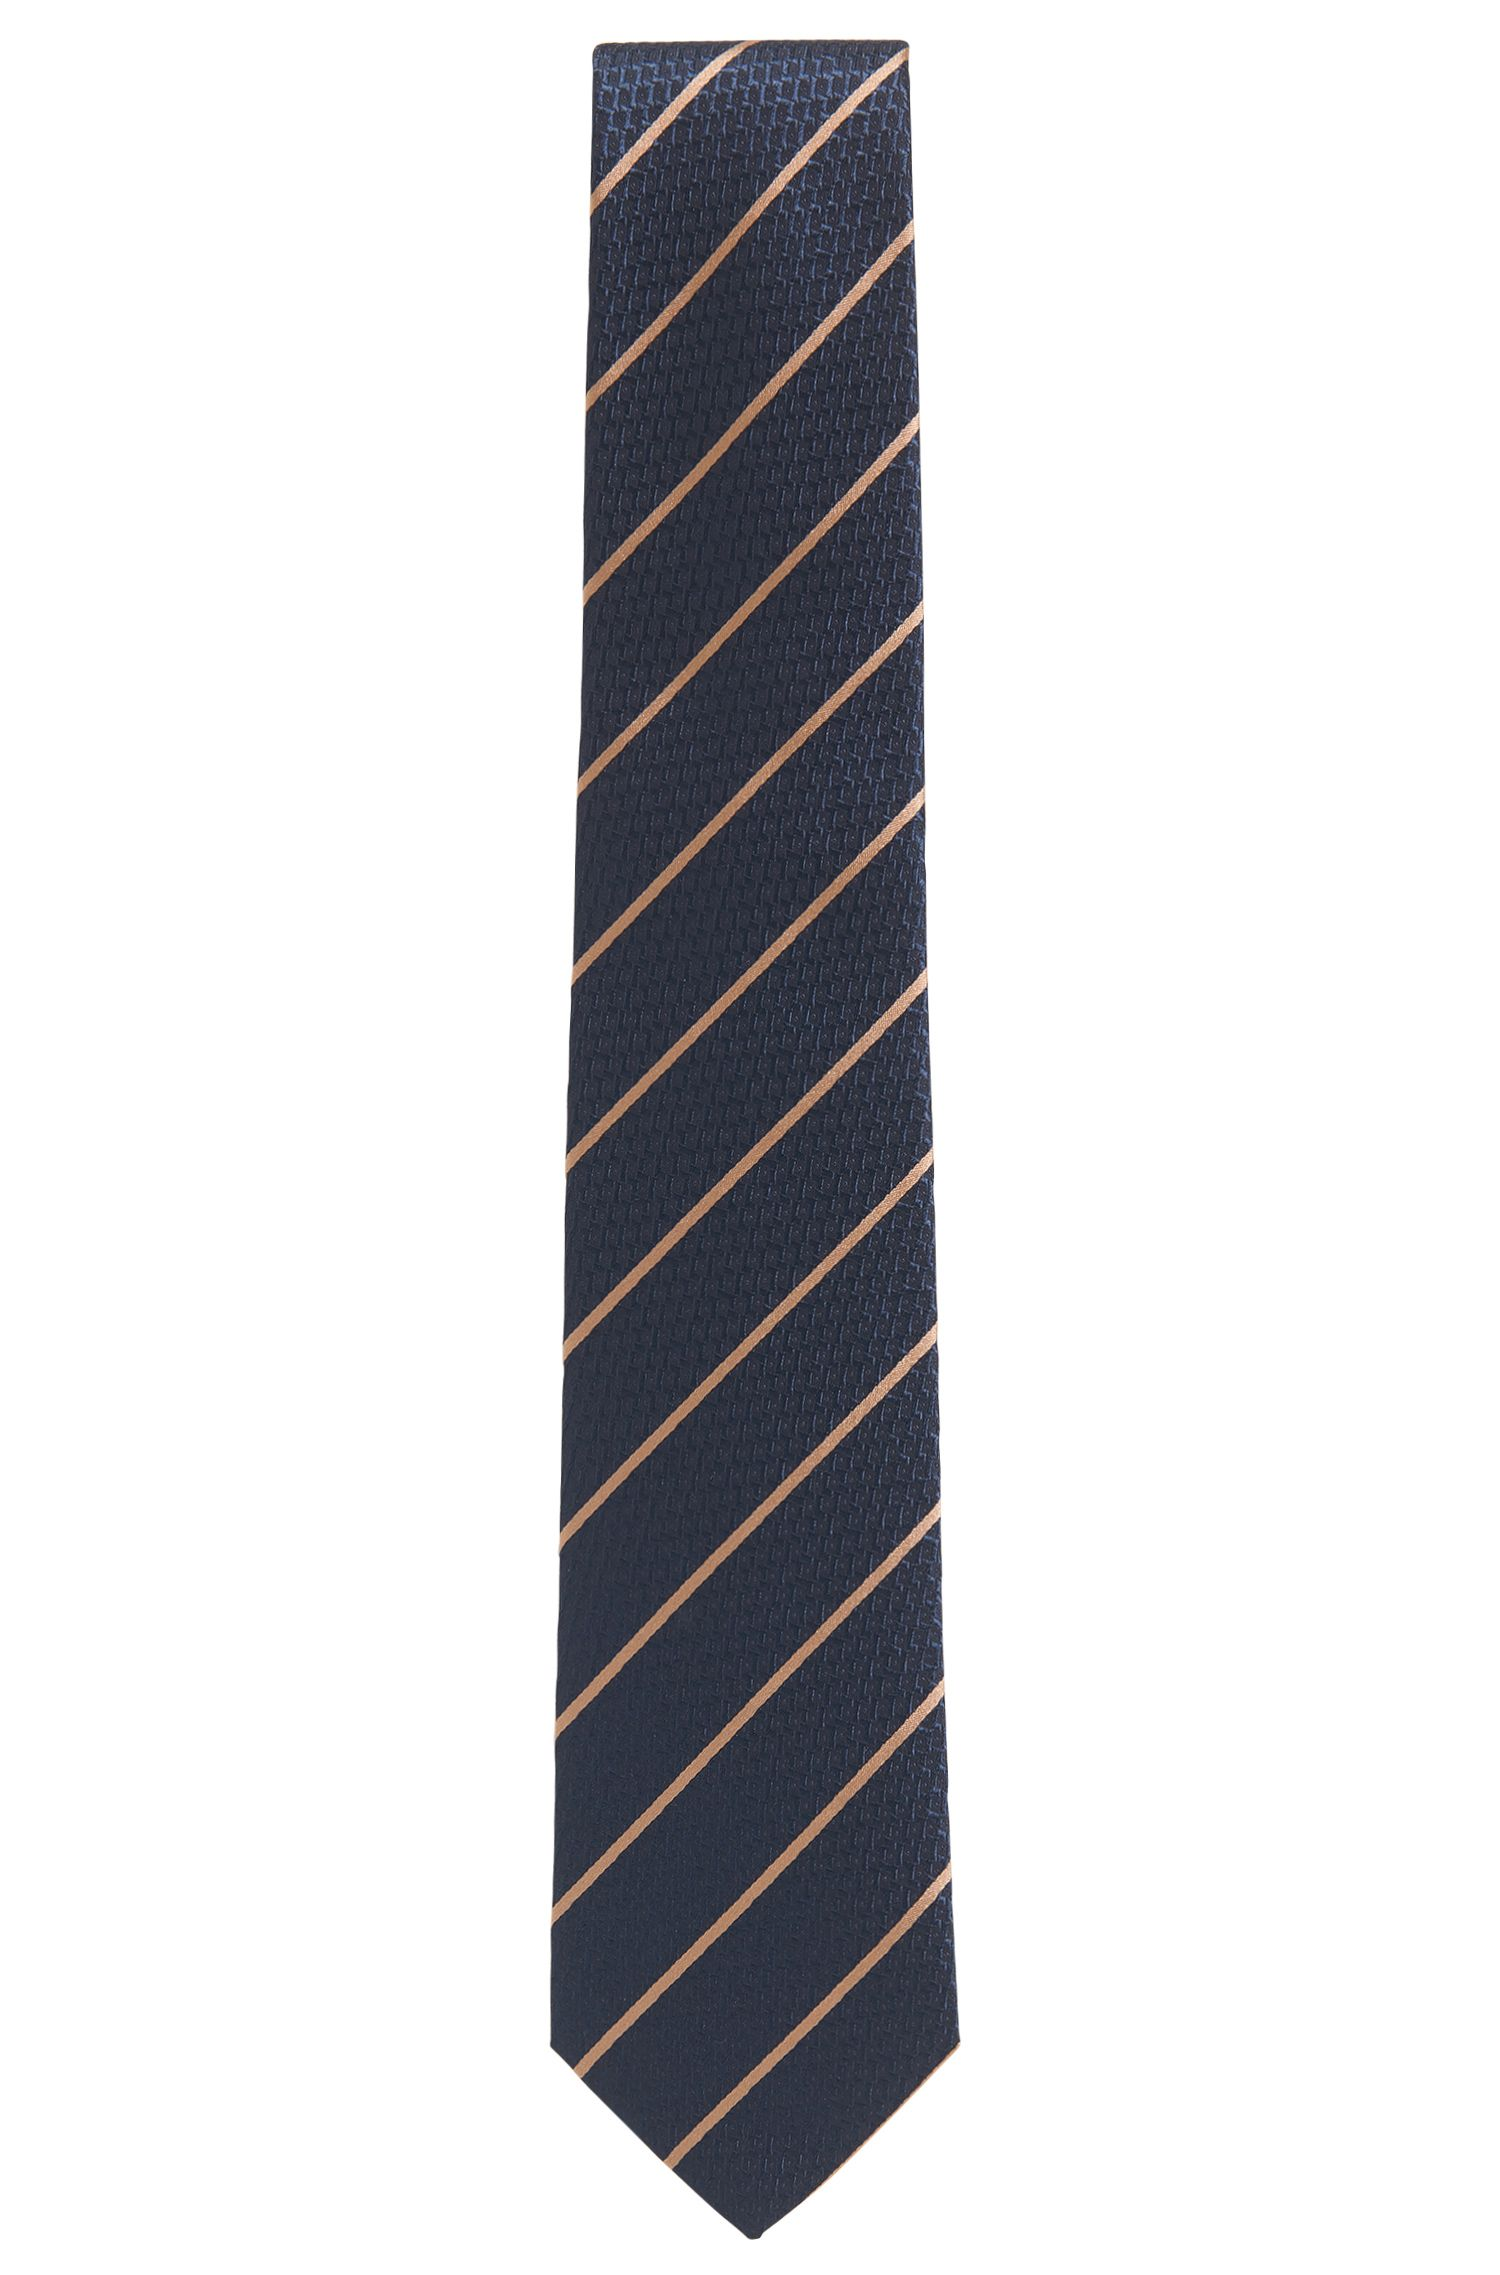 Diagonal striped tie in a textured silk jacquard